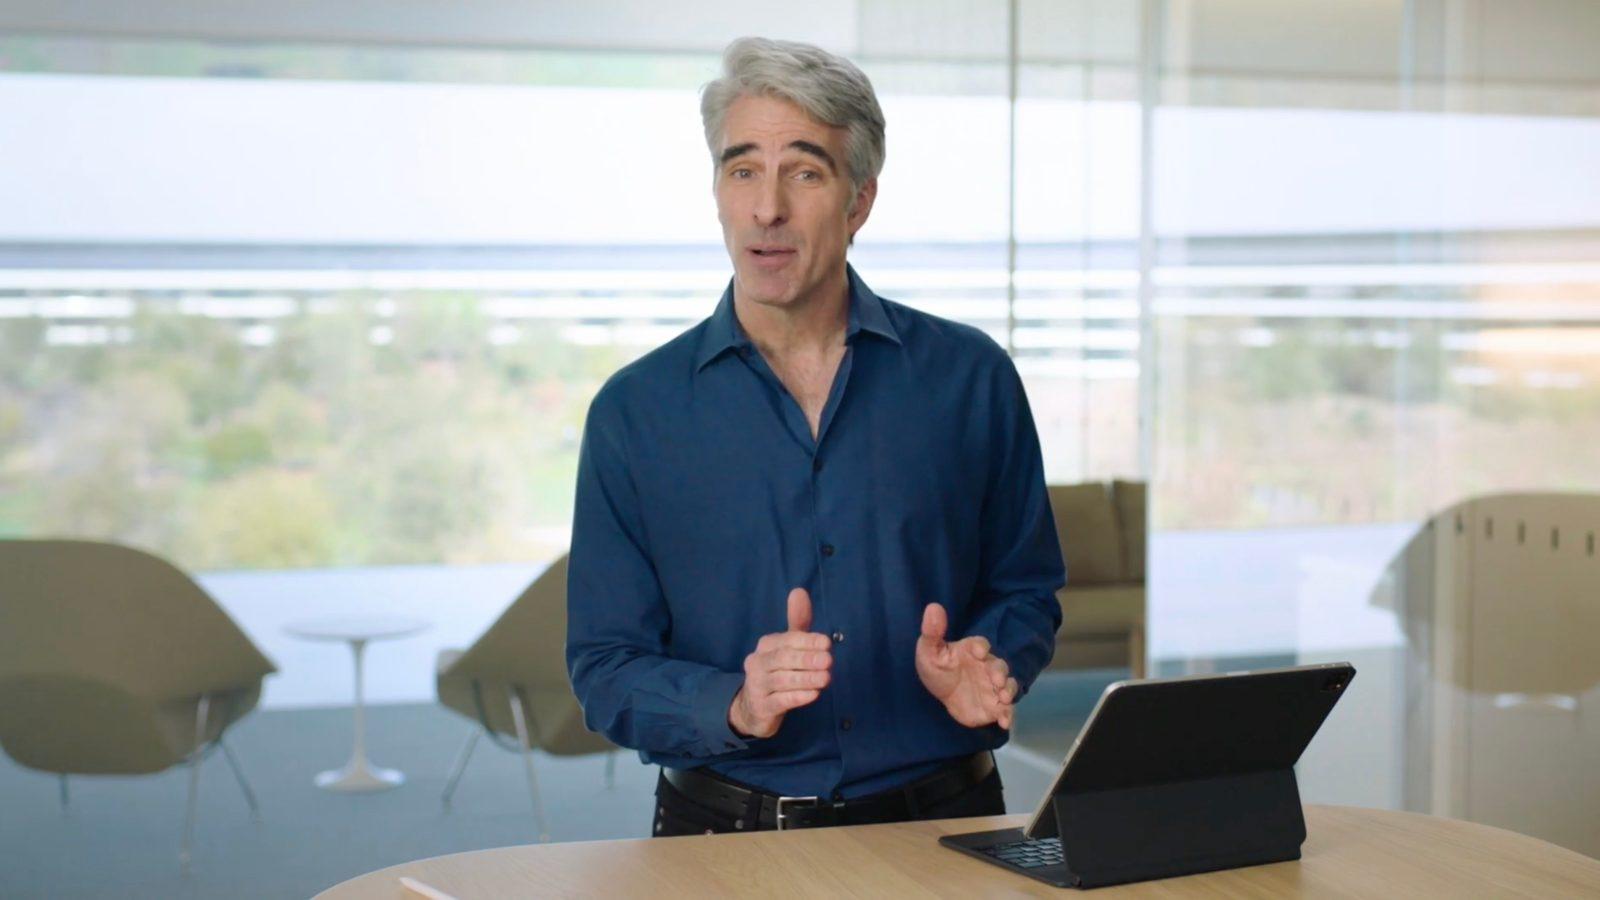 Watch Craig Federighi Demo The New Ipad Pro And Magic Keyboard With Trackpad 9to5mac